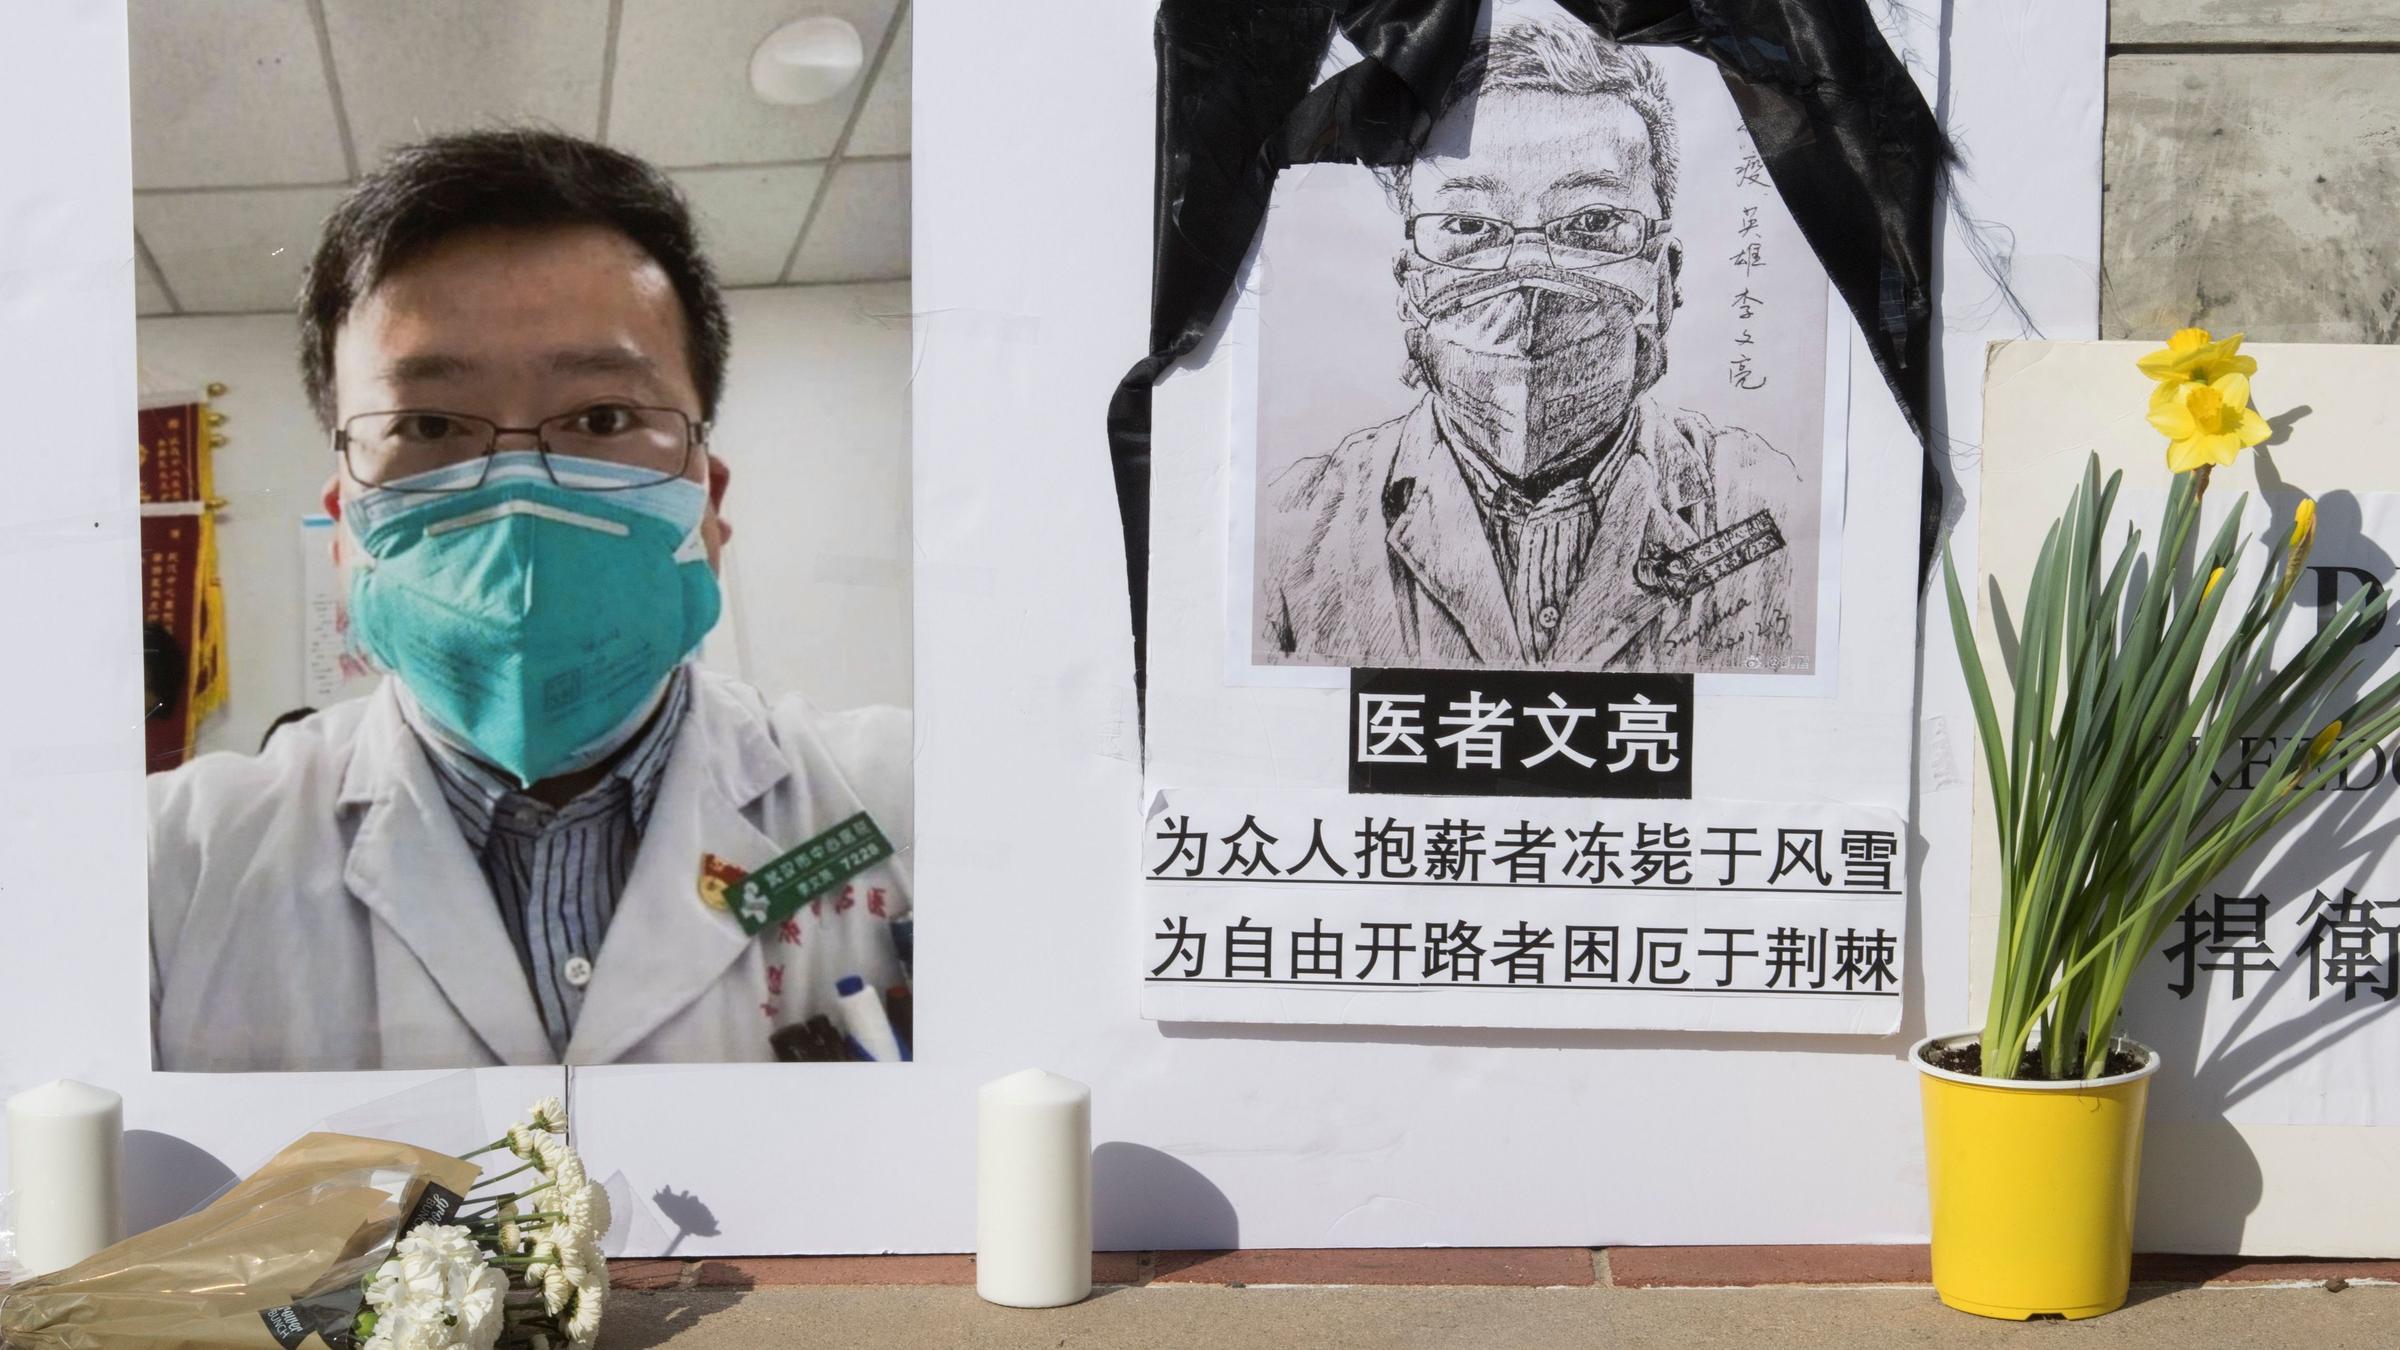 Wuhan to revoke reprimand against deceased whistleblower doctor